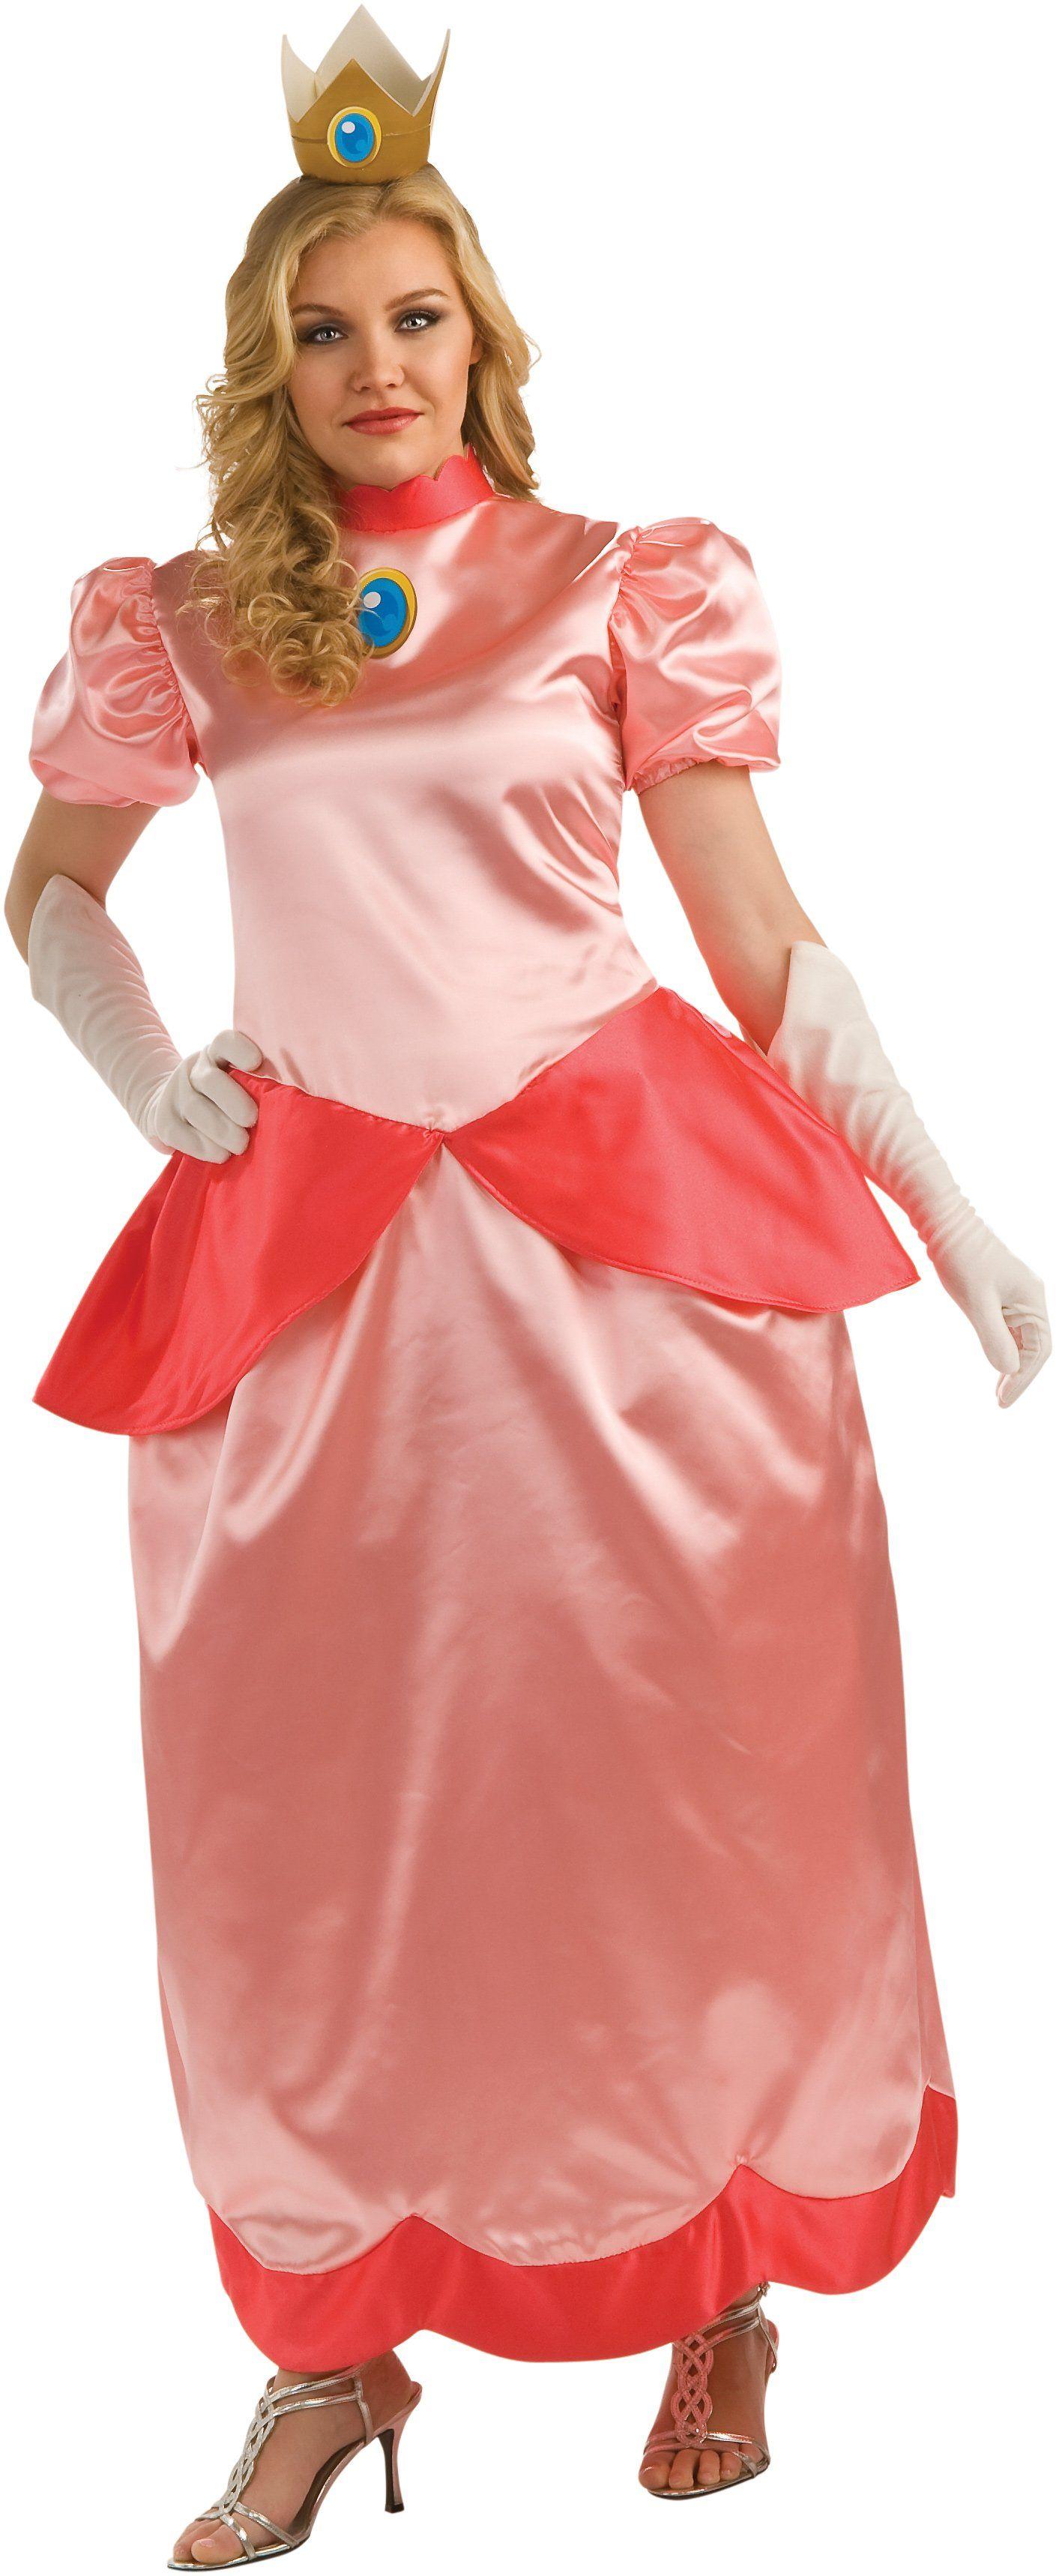 Super Mario Brothers Deluxe Princess Peach Plus Size Costume - Pure Costumes  sc 1 st  Pinterest & Super Mario Bros. - Deluxe Princess Peach Plus Adult Costume ...